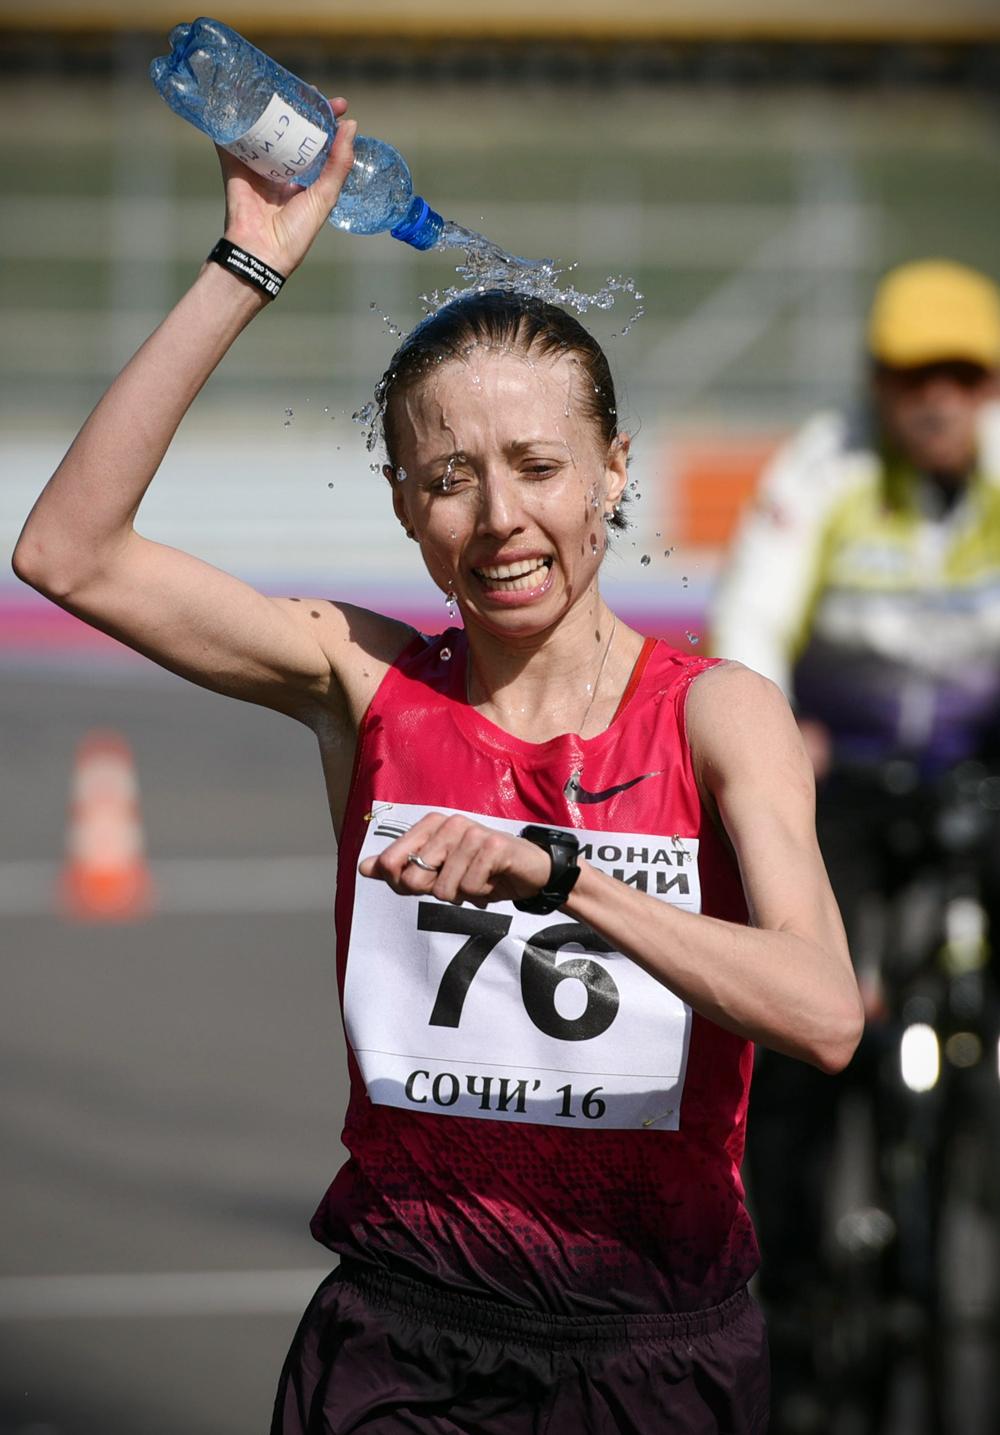 Foto: Nina Zotina/RIA Novosti